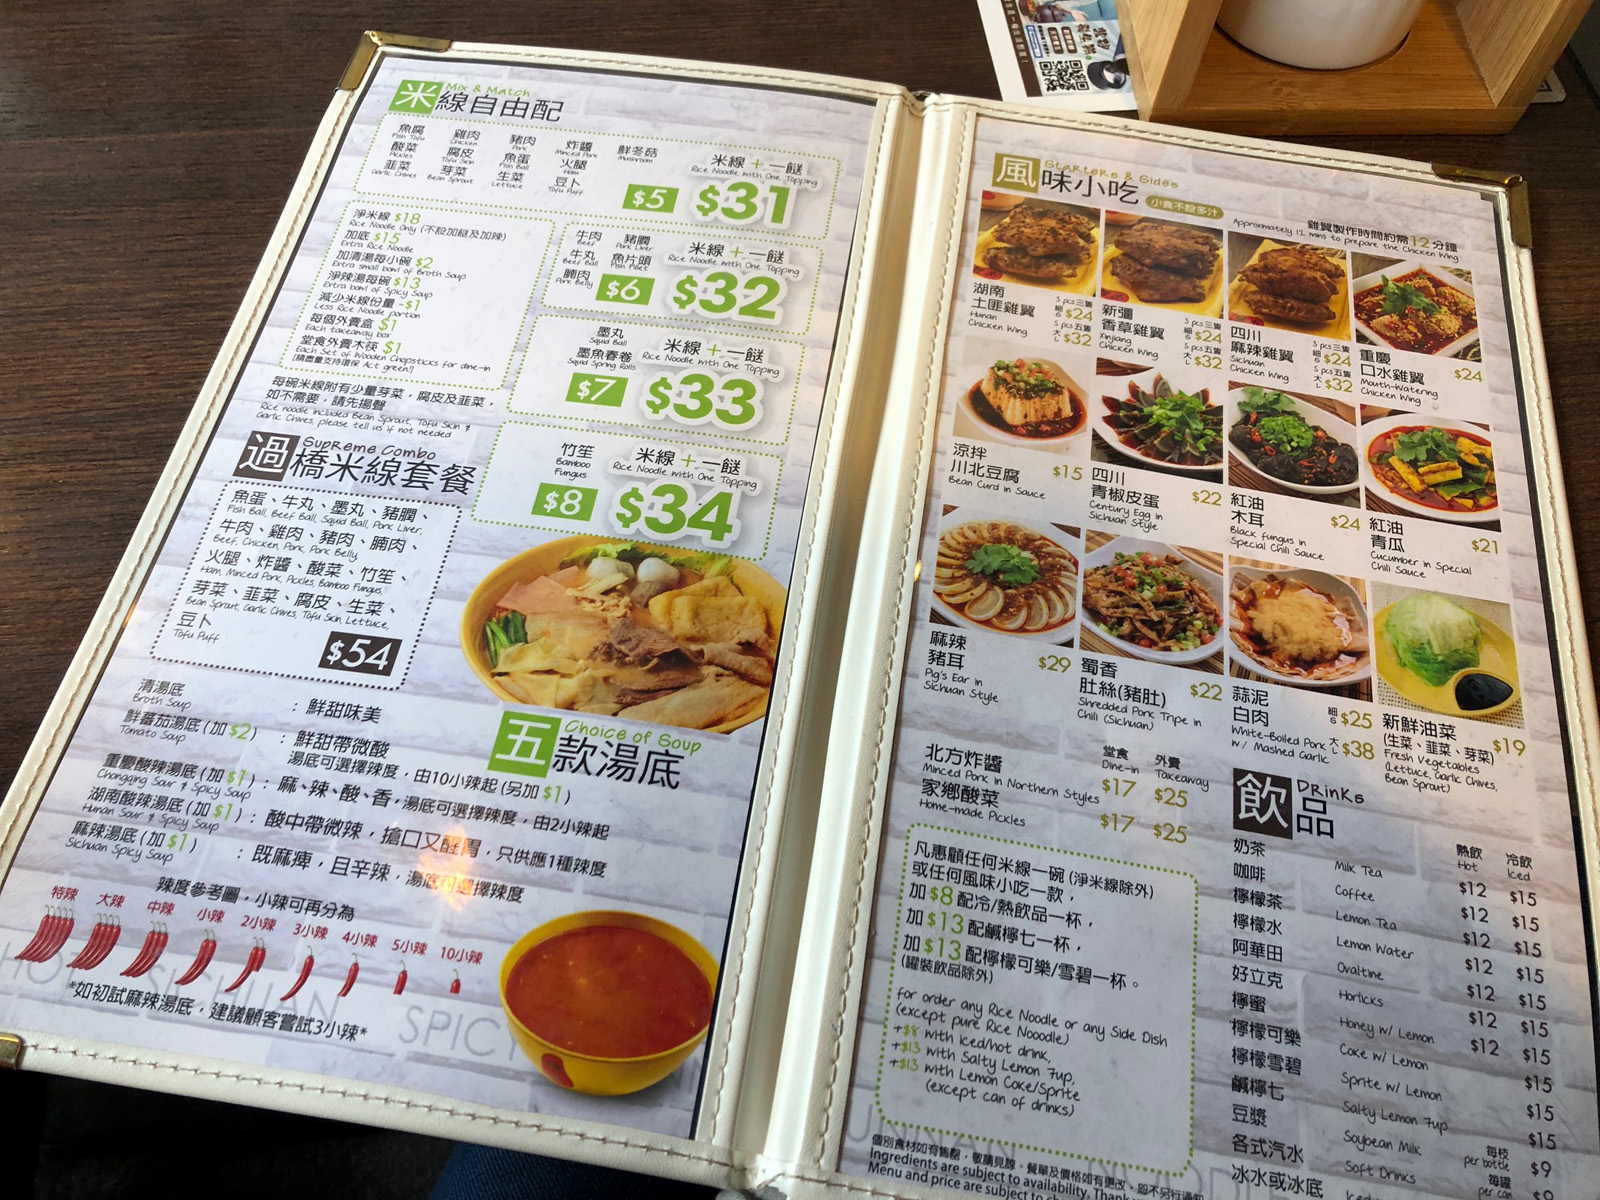 "Hong-Kong_Tam-Chai_menu"""""